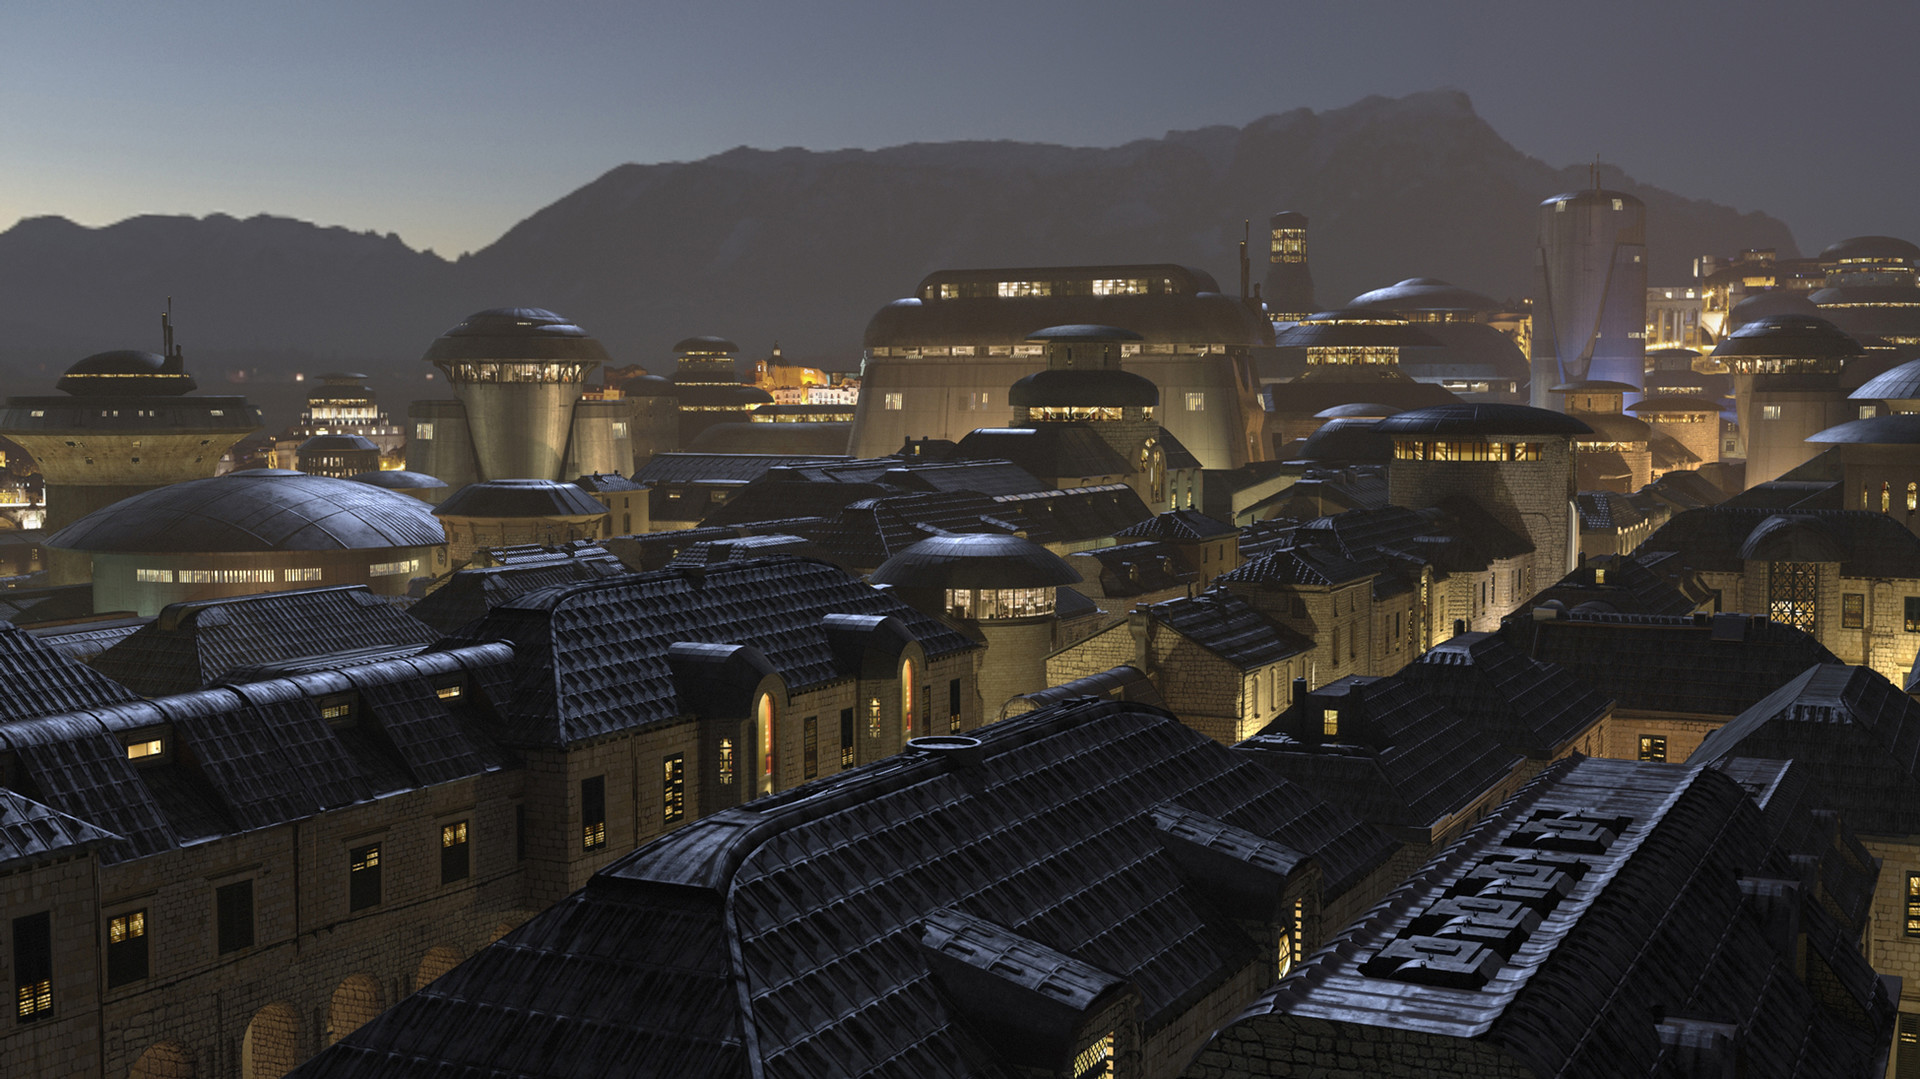 Rodolfo damaggio rooftops art